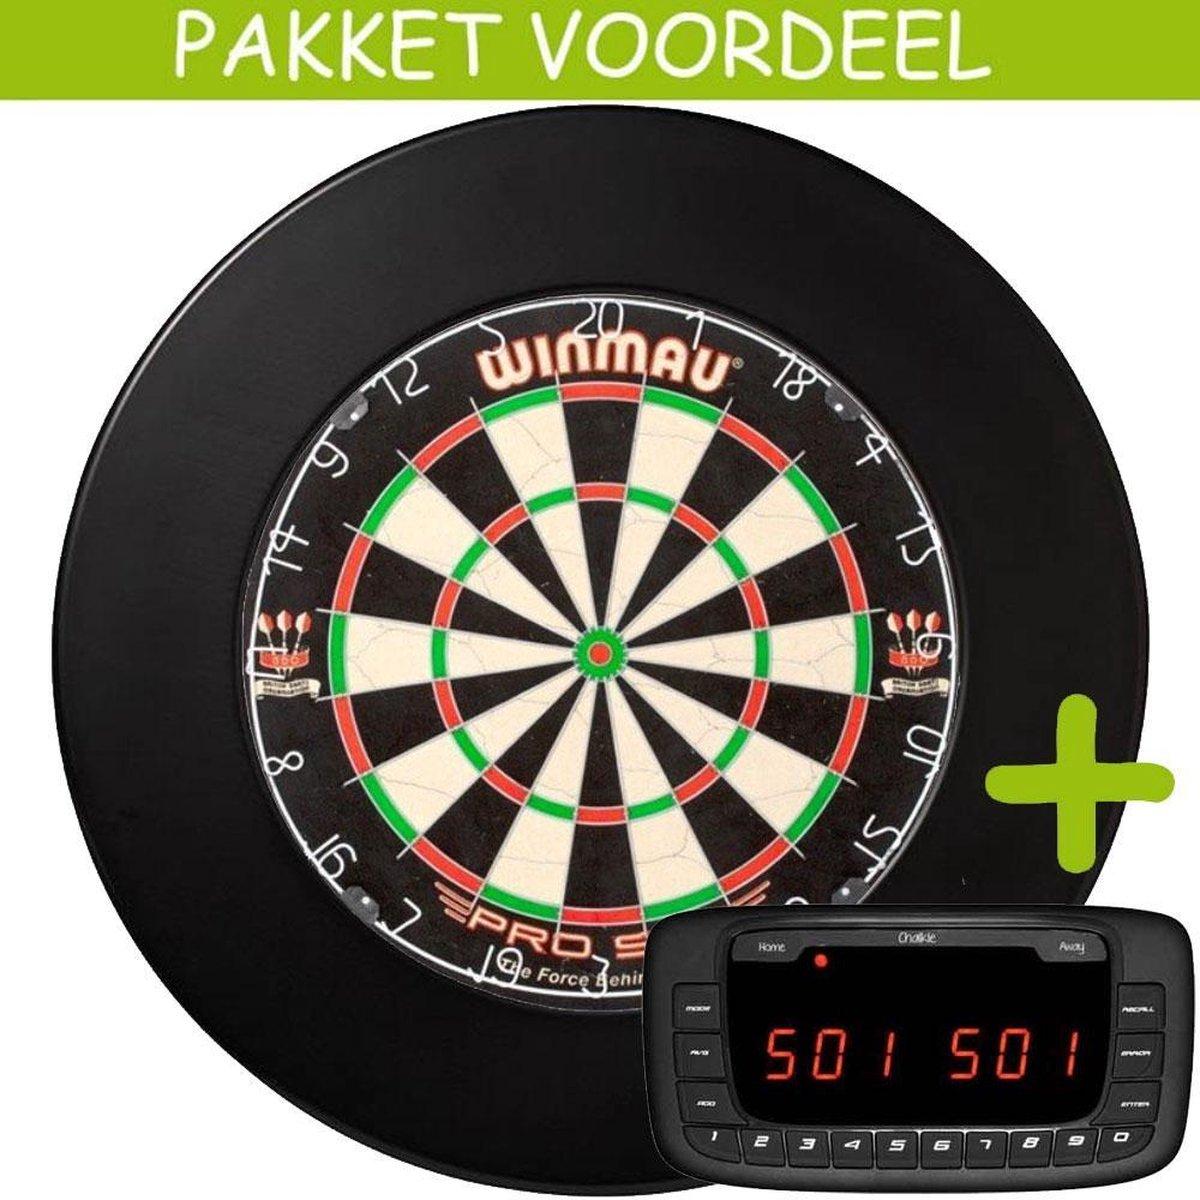 Elektronisch Dart Scorebord VoordeelPakket (Chalkie ) - Pro SFB - Rubberen Surround (Zwart)